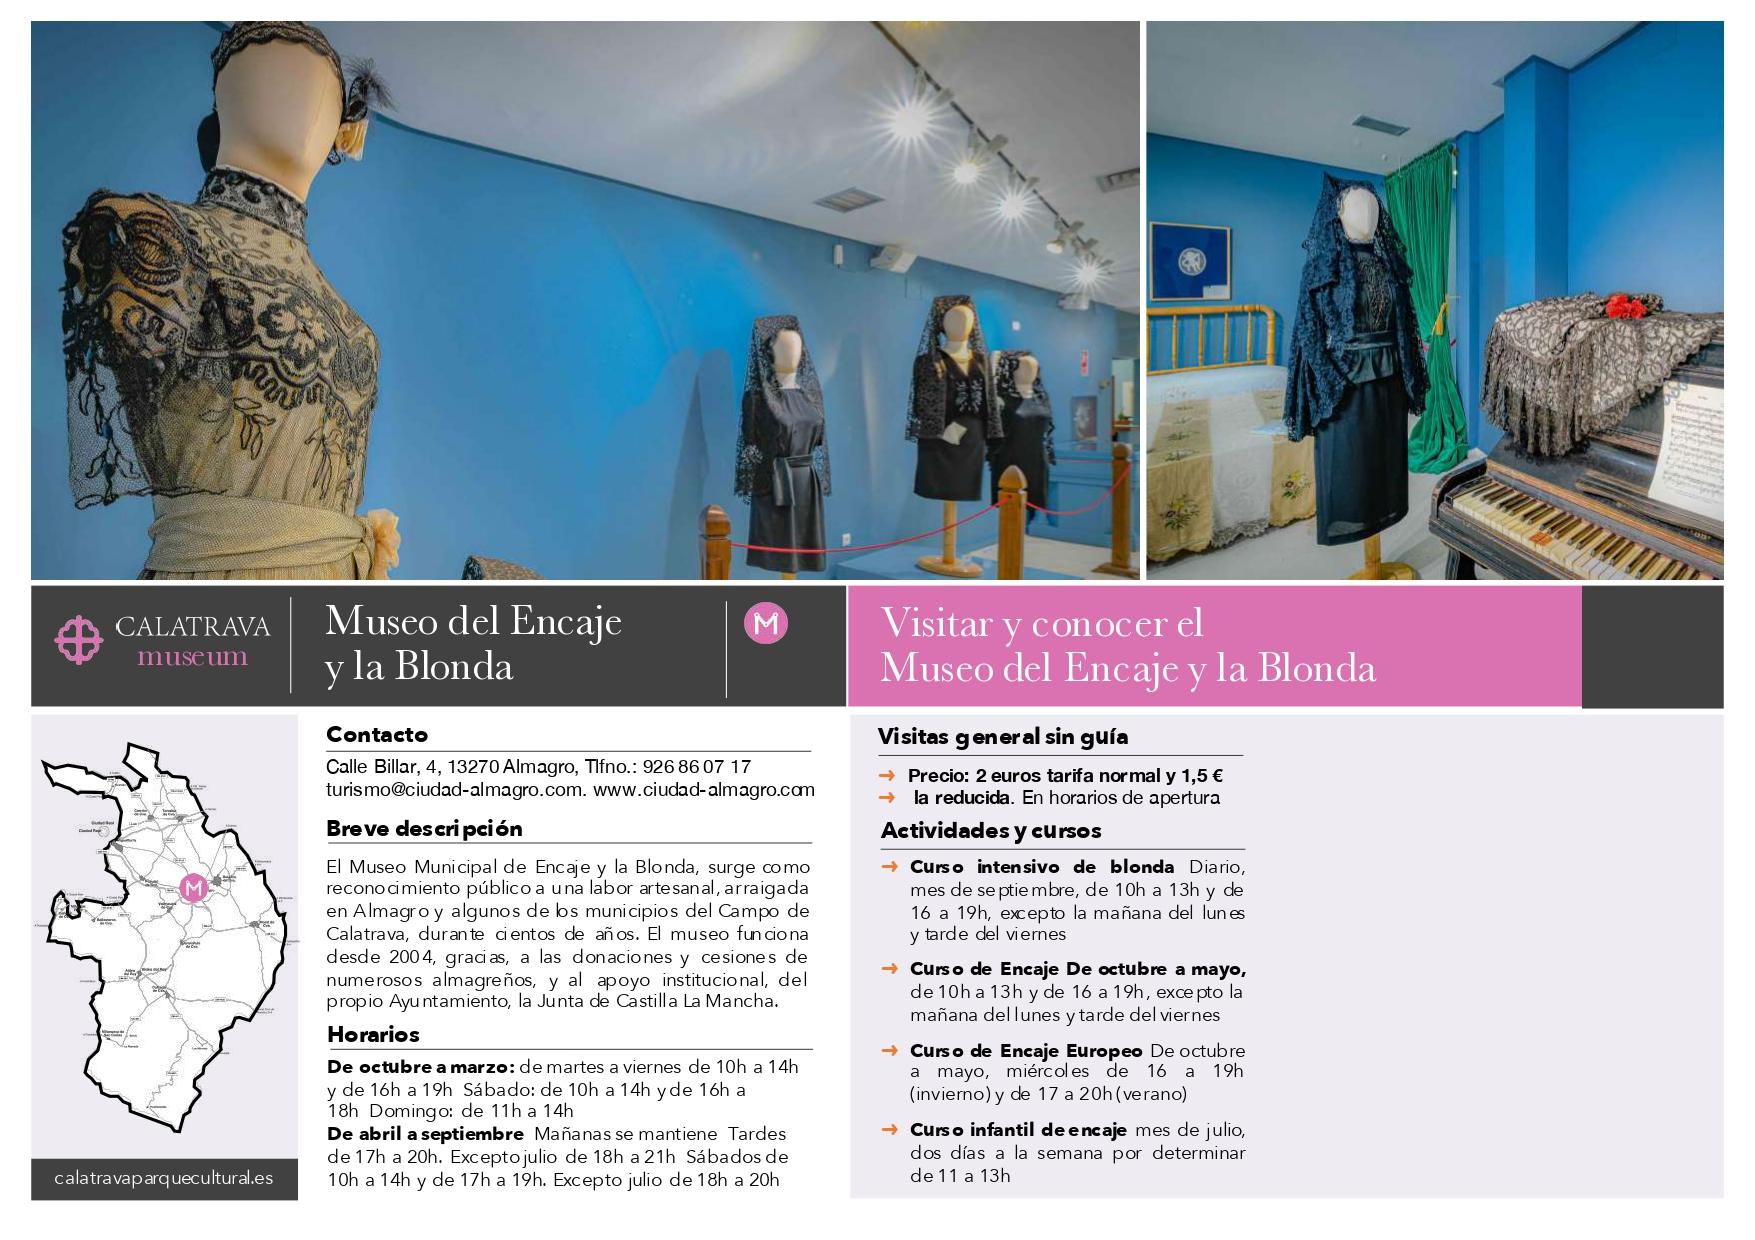 mapa-Museo del Encaje